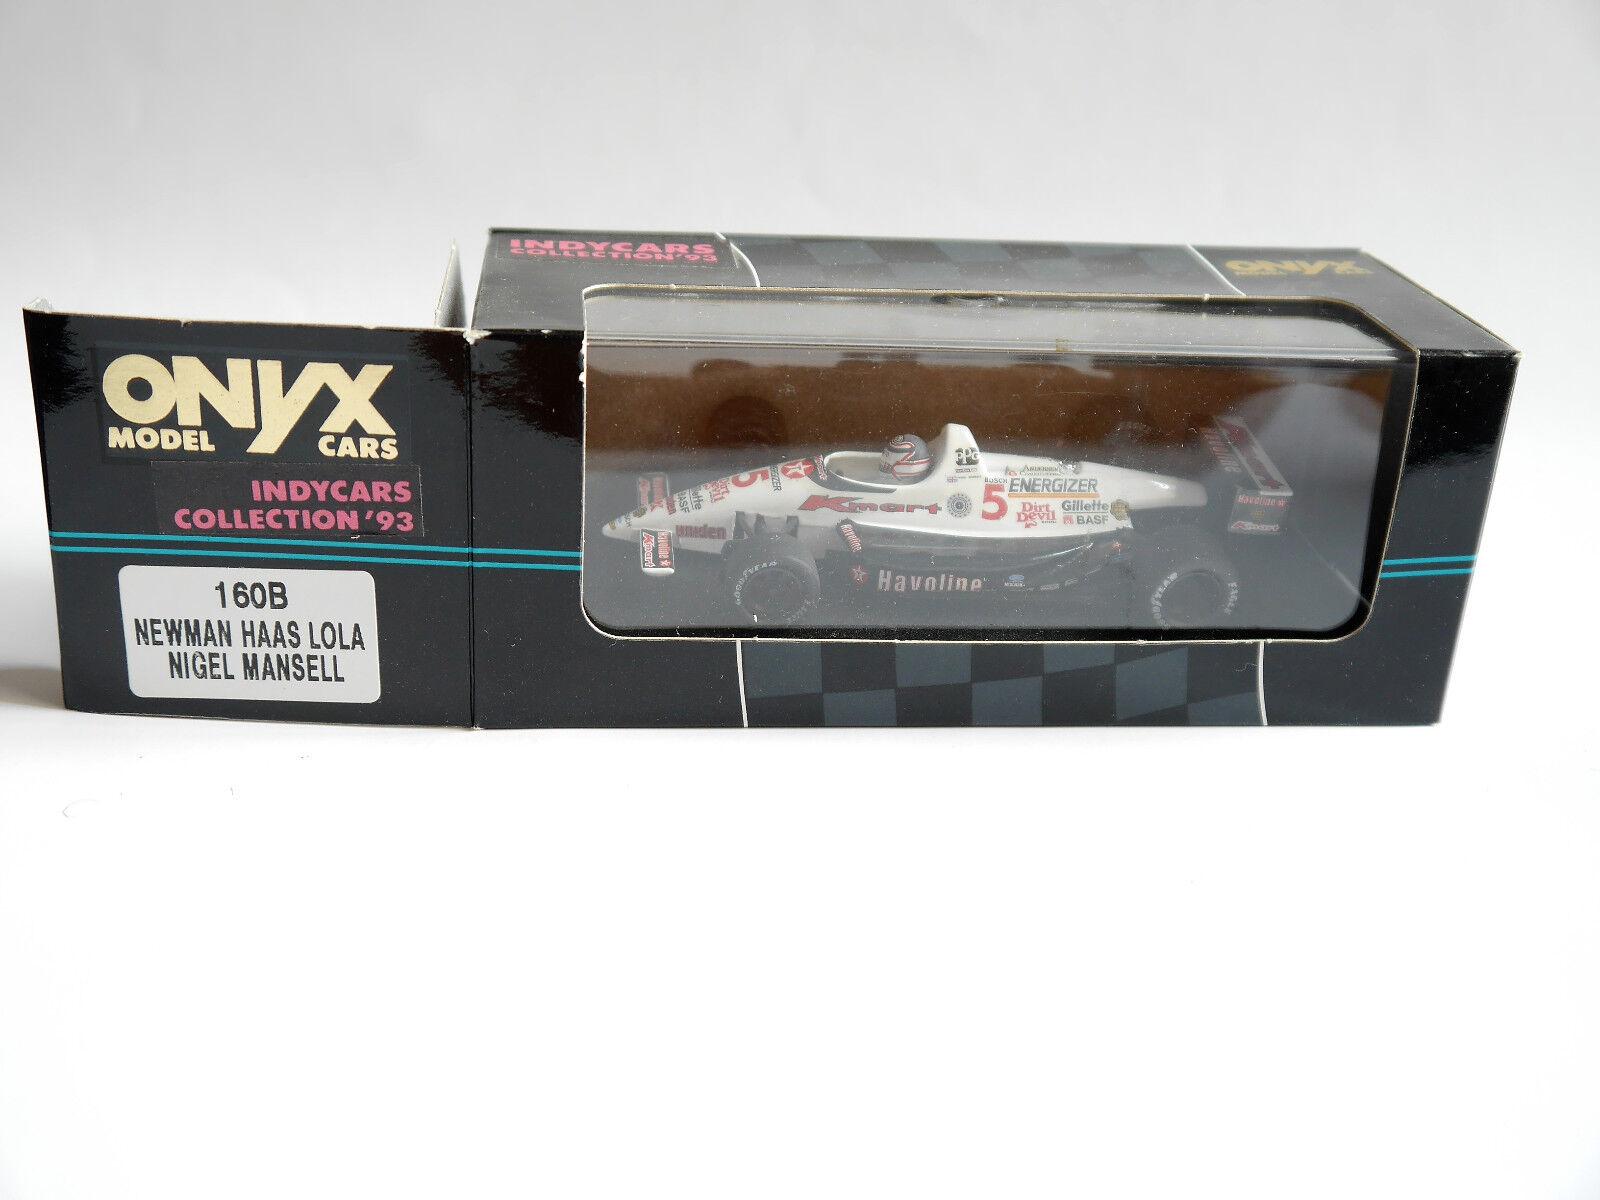 Indy 500 1993 - Newman Haas Lola   Nigel Nigel Nigel Mansell RED FIVE 5, Onyx in 1 43 boxed  0479cb